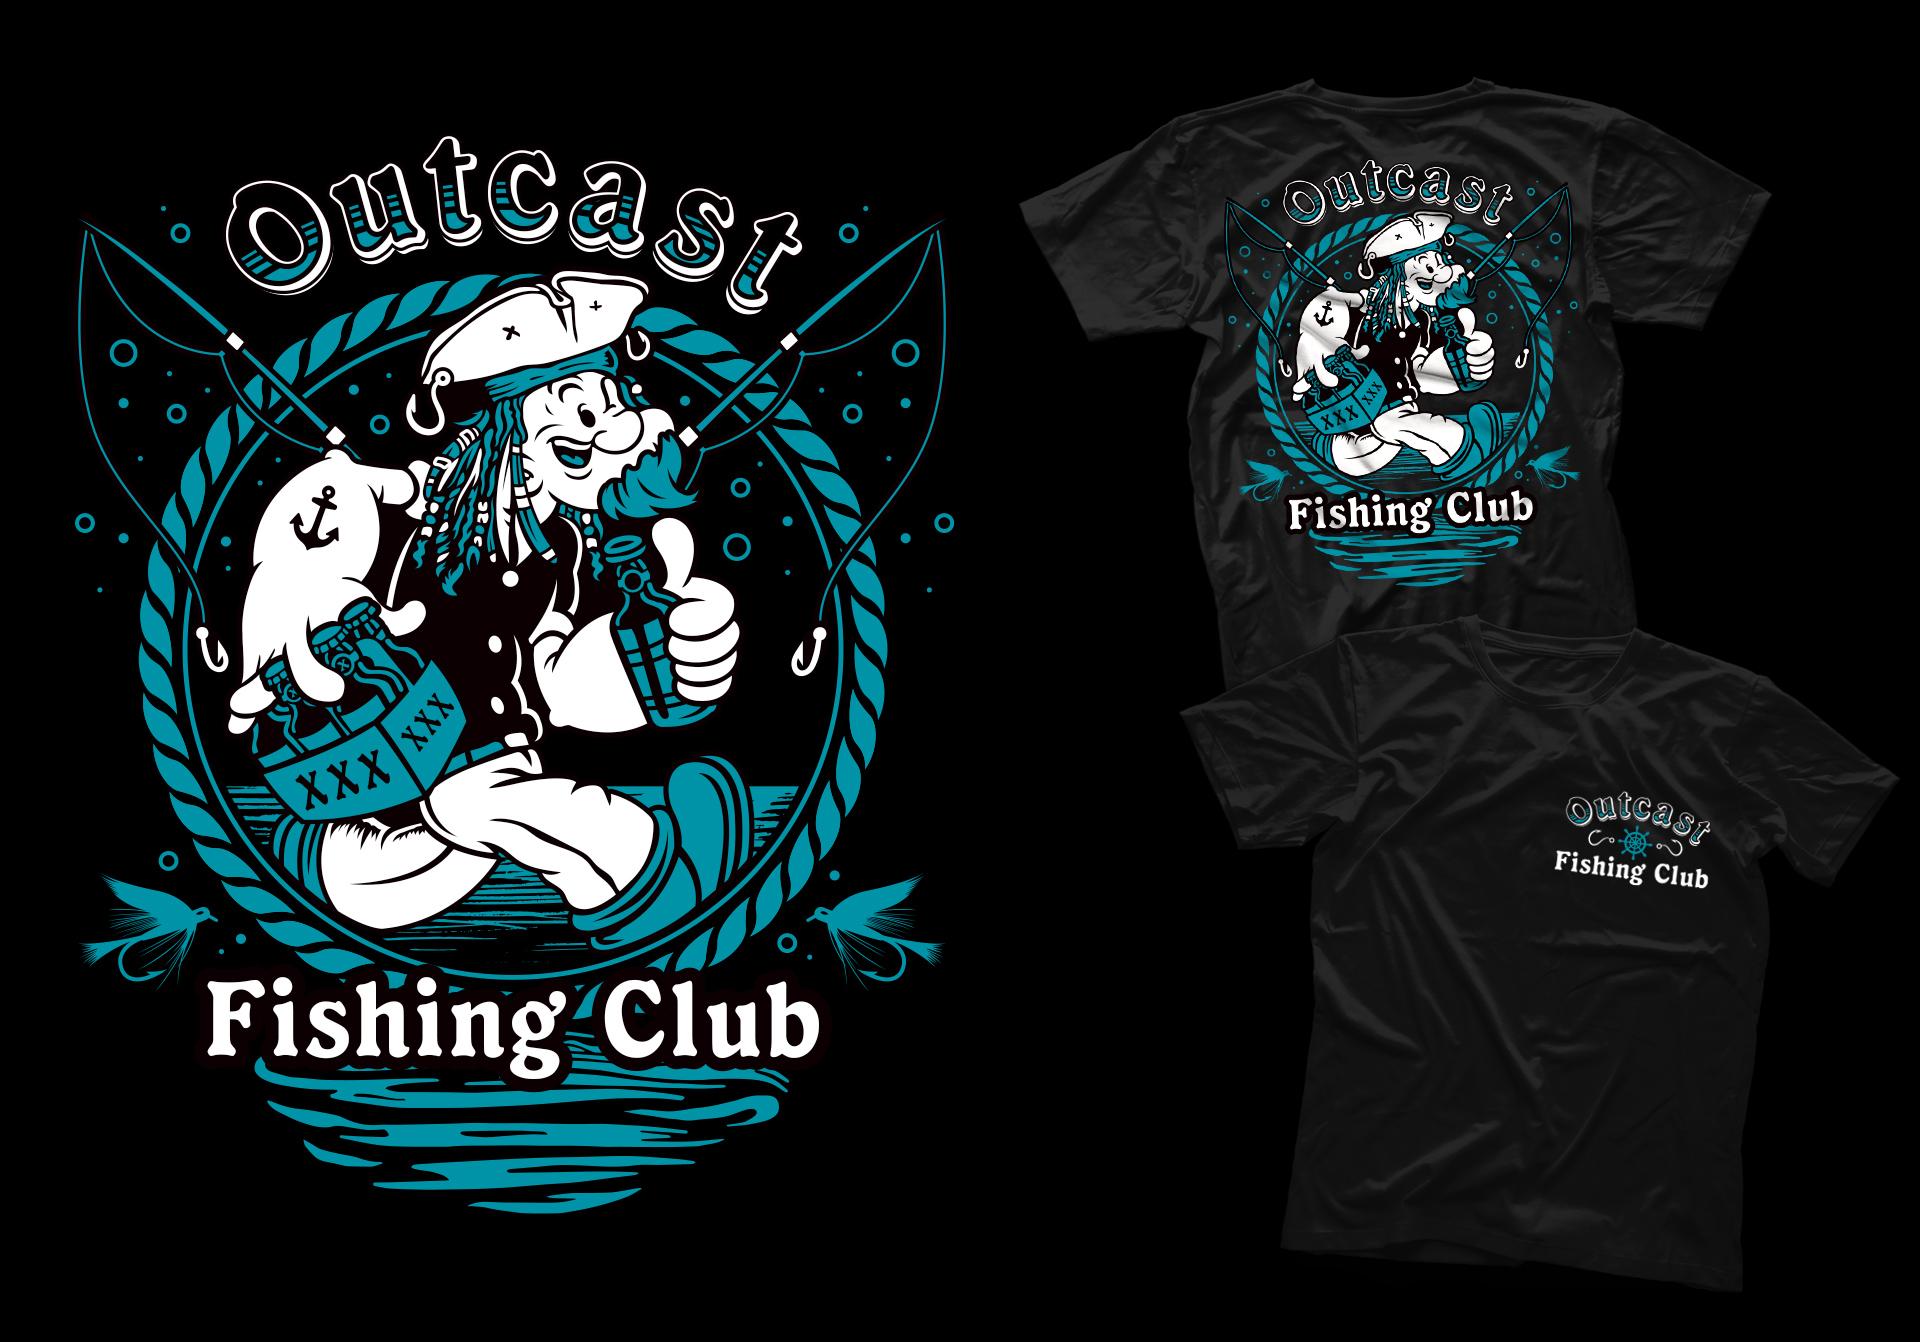 Honey Rogue Design Shirt Outcast Fishing Club